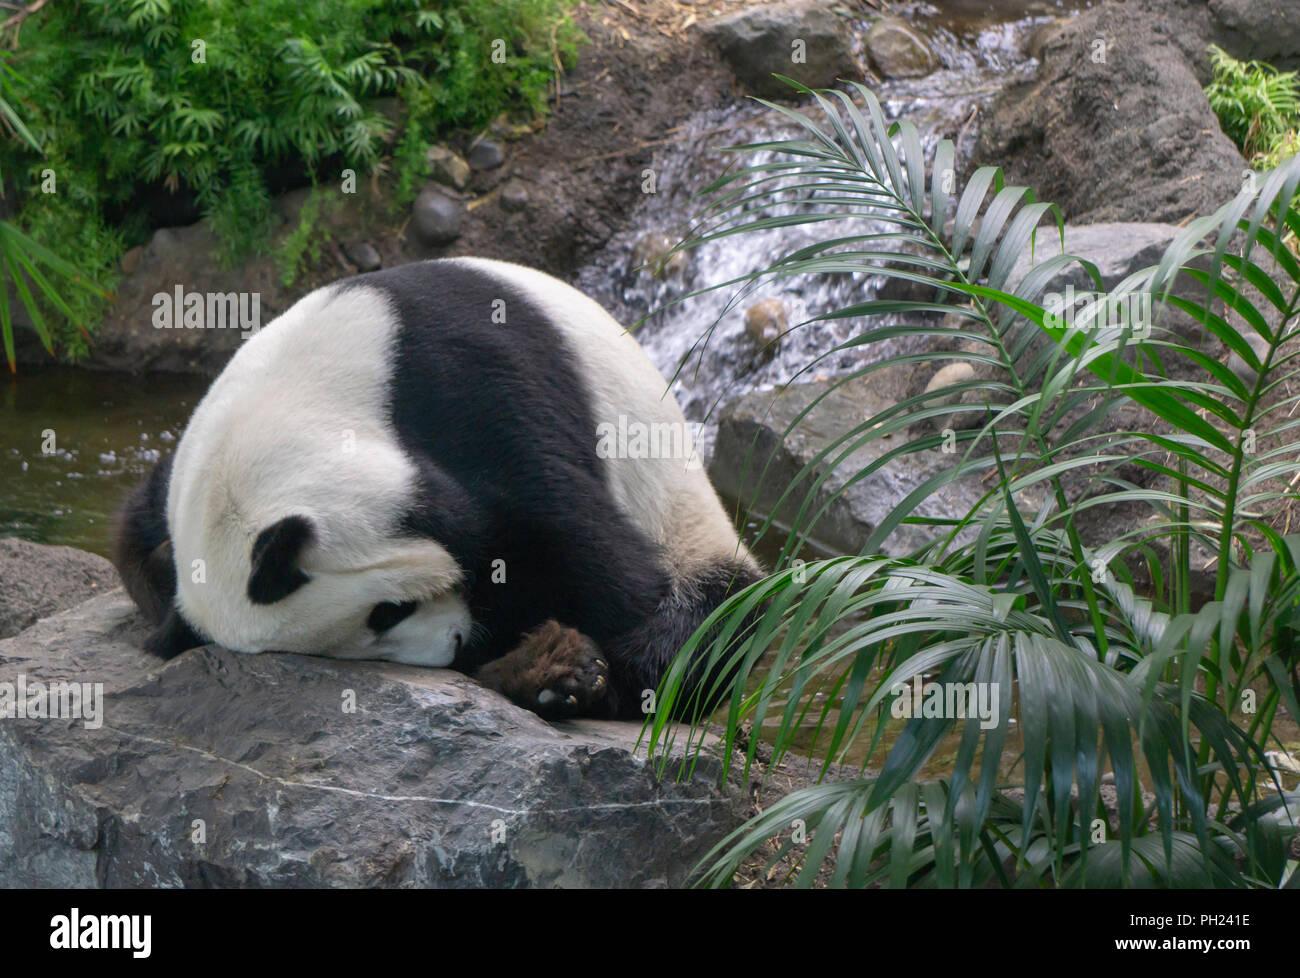 Panda Zoo Calgary Alberta Kanada Stockbild